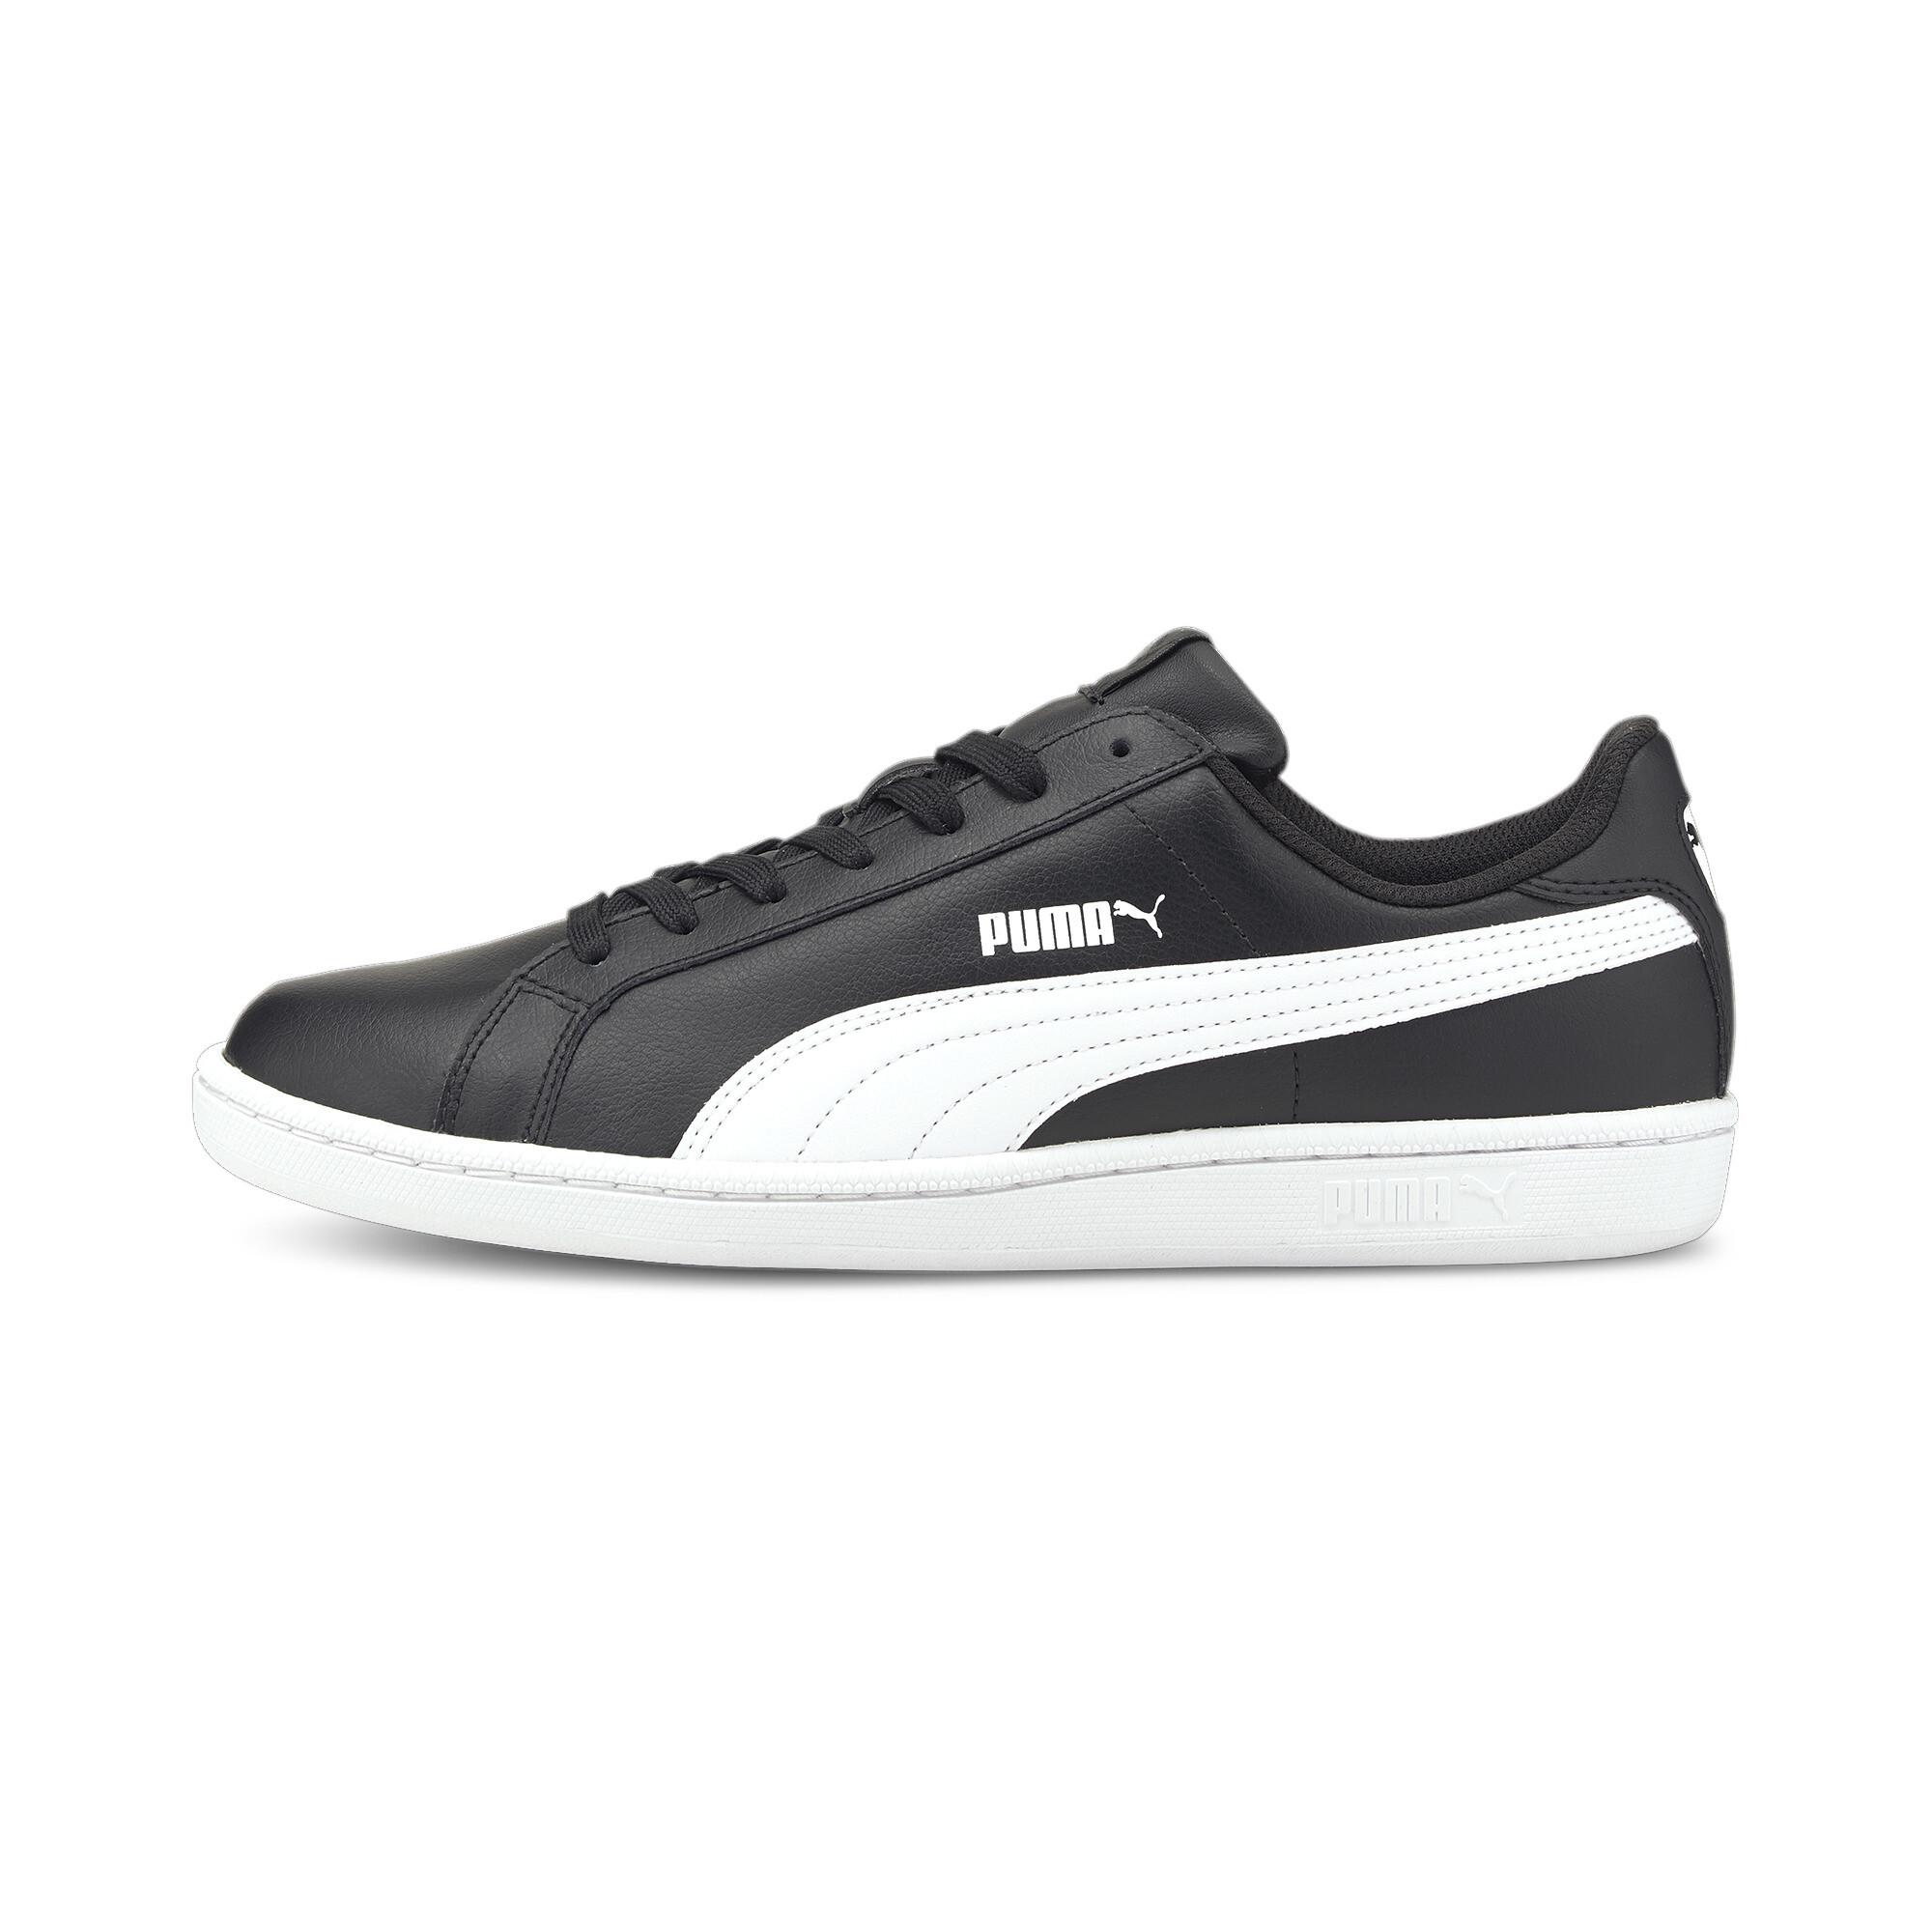 PUMA-Smash-Trainers-Schuhe-Sneakers-Sport-Classics-Unisex-Neu Indexbild 24